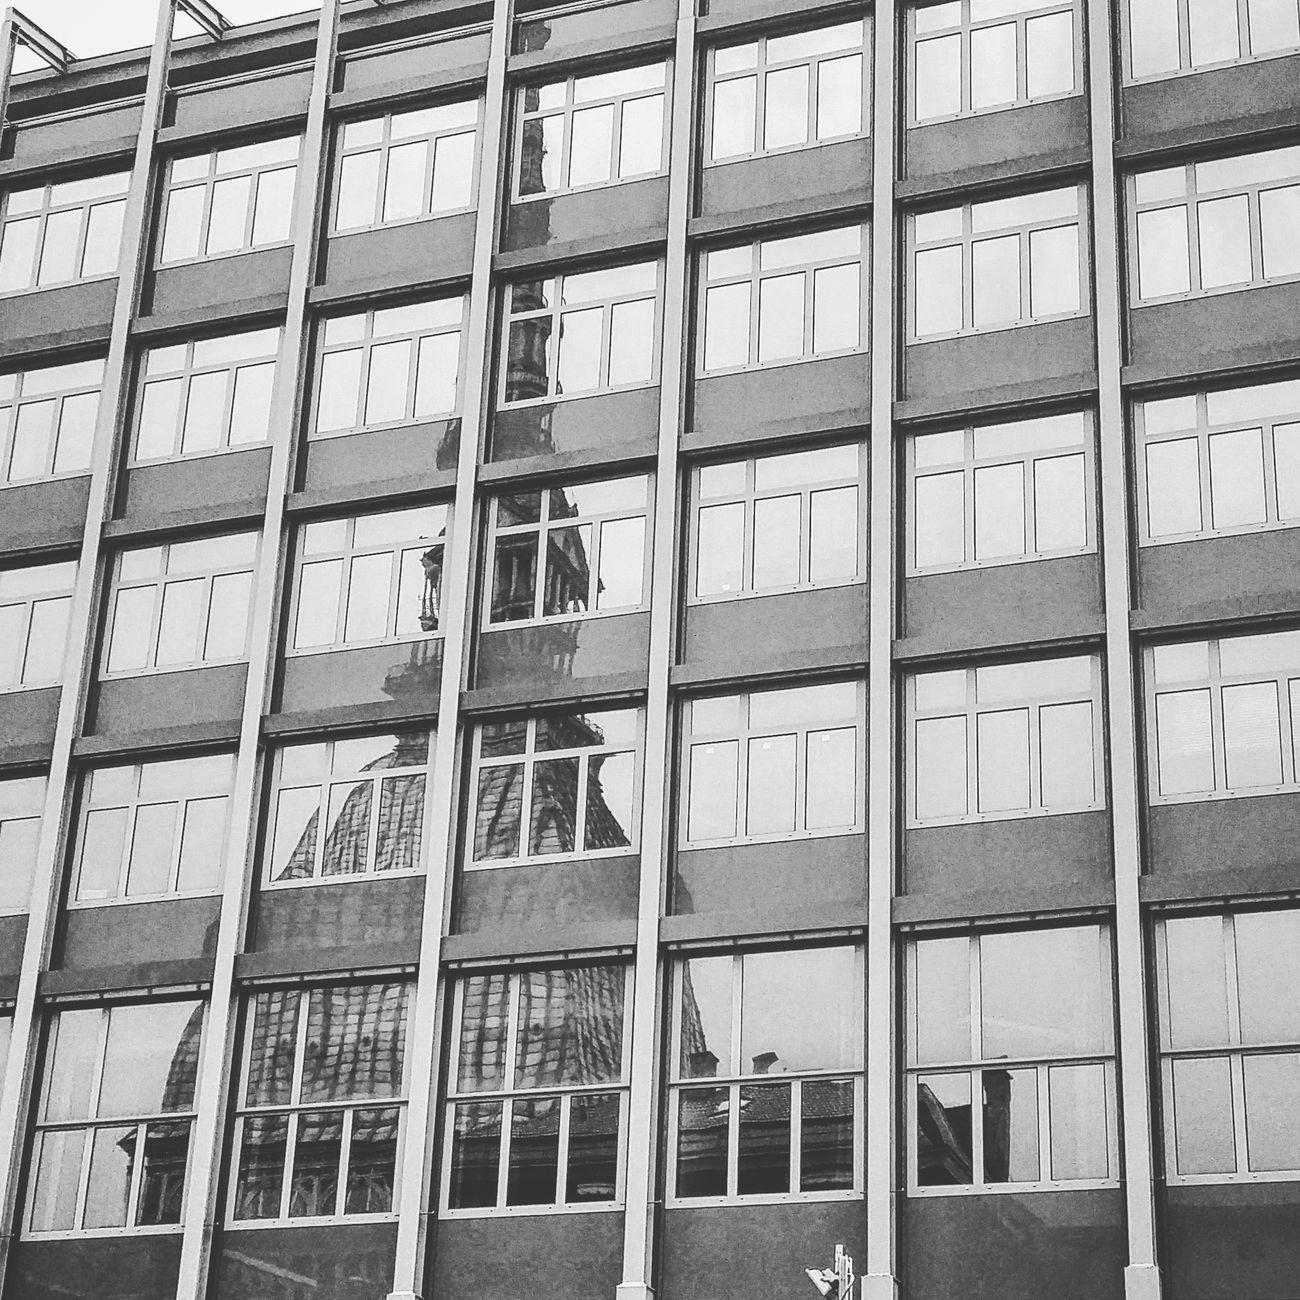 La mole Check This Out Torino Turinitaly Torinoélamiacittá Torino, Italy Torinodigitale Torinoècasamia Torinocentro Torinodascoprire Torino , La Mole Torinopics Torinoèbella Torinonascosta Torinomaivista Torinoquantoseibella Turin Italy Turinheart Turin_city Home Is Where The Art Is